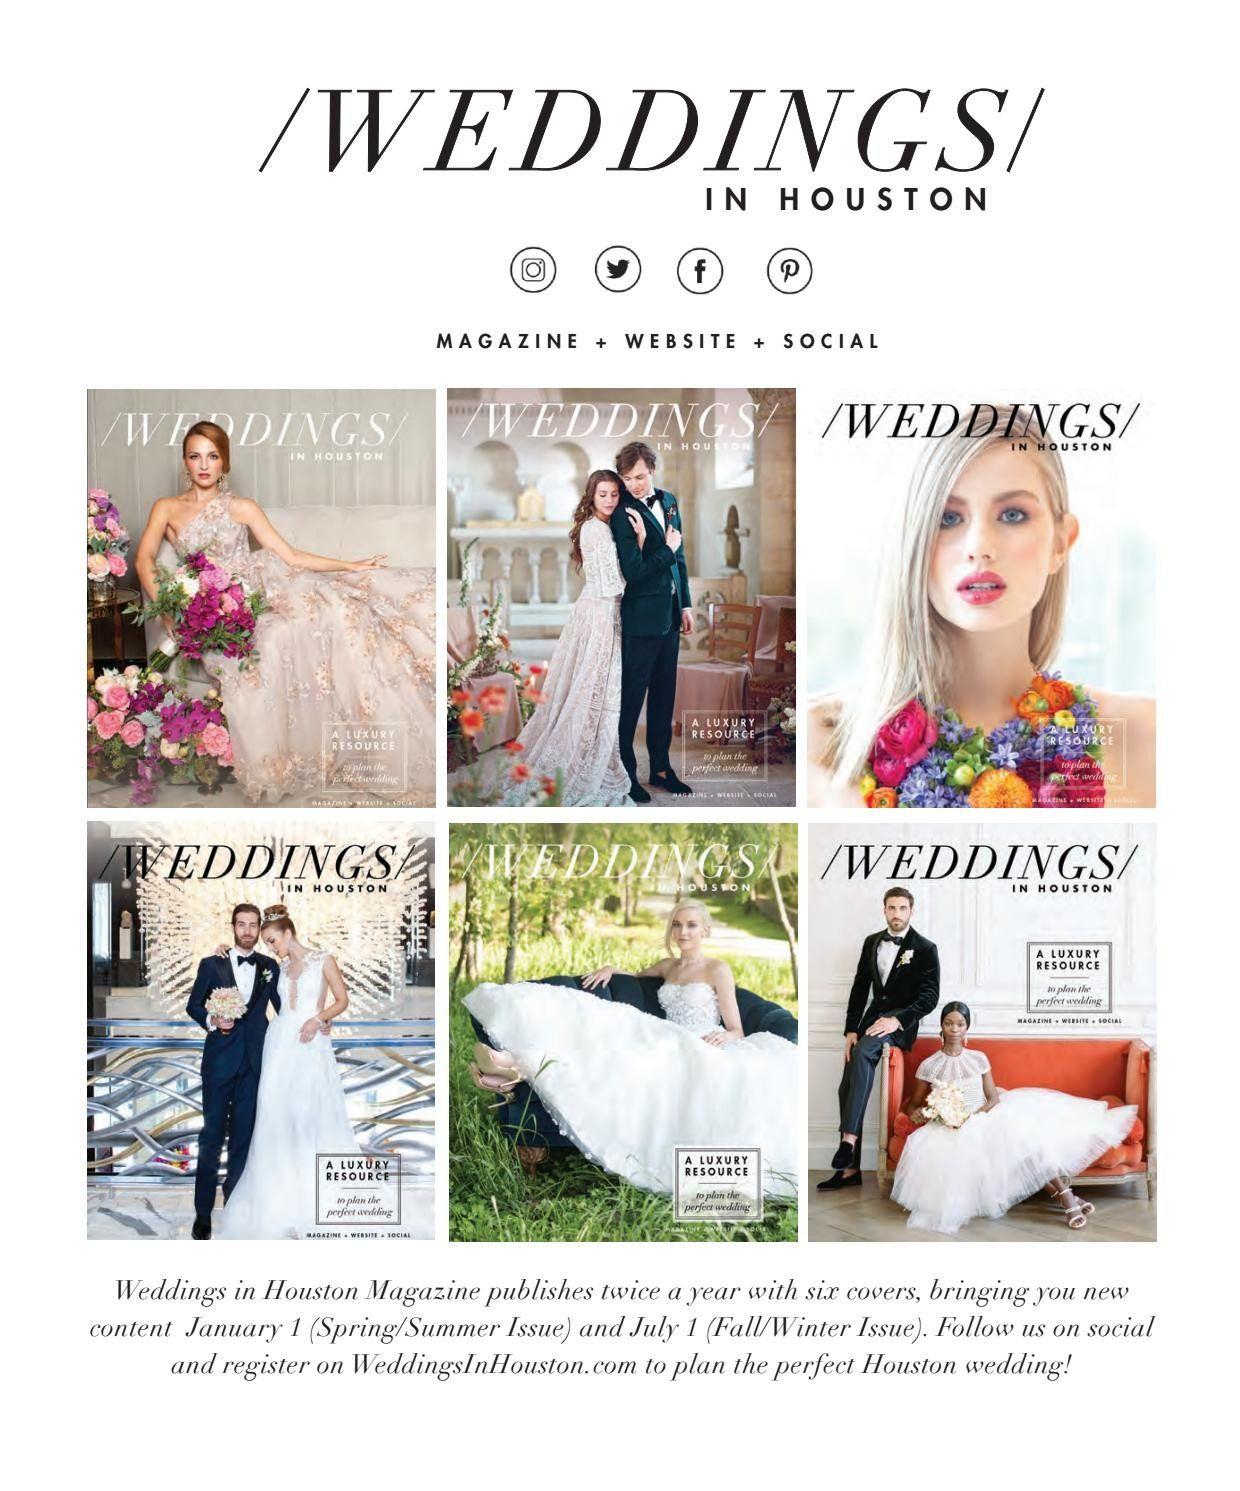 Lucille Ball Wedding Gown Elegant Weddings In Houston Magazine Spring Summer 2019 Iss Blue Wedding Dresses Wedding Dress Preservation Wedding Dress Alterations